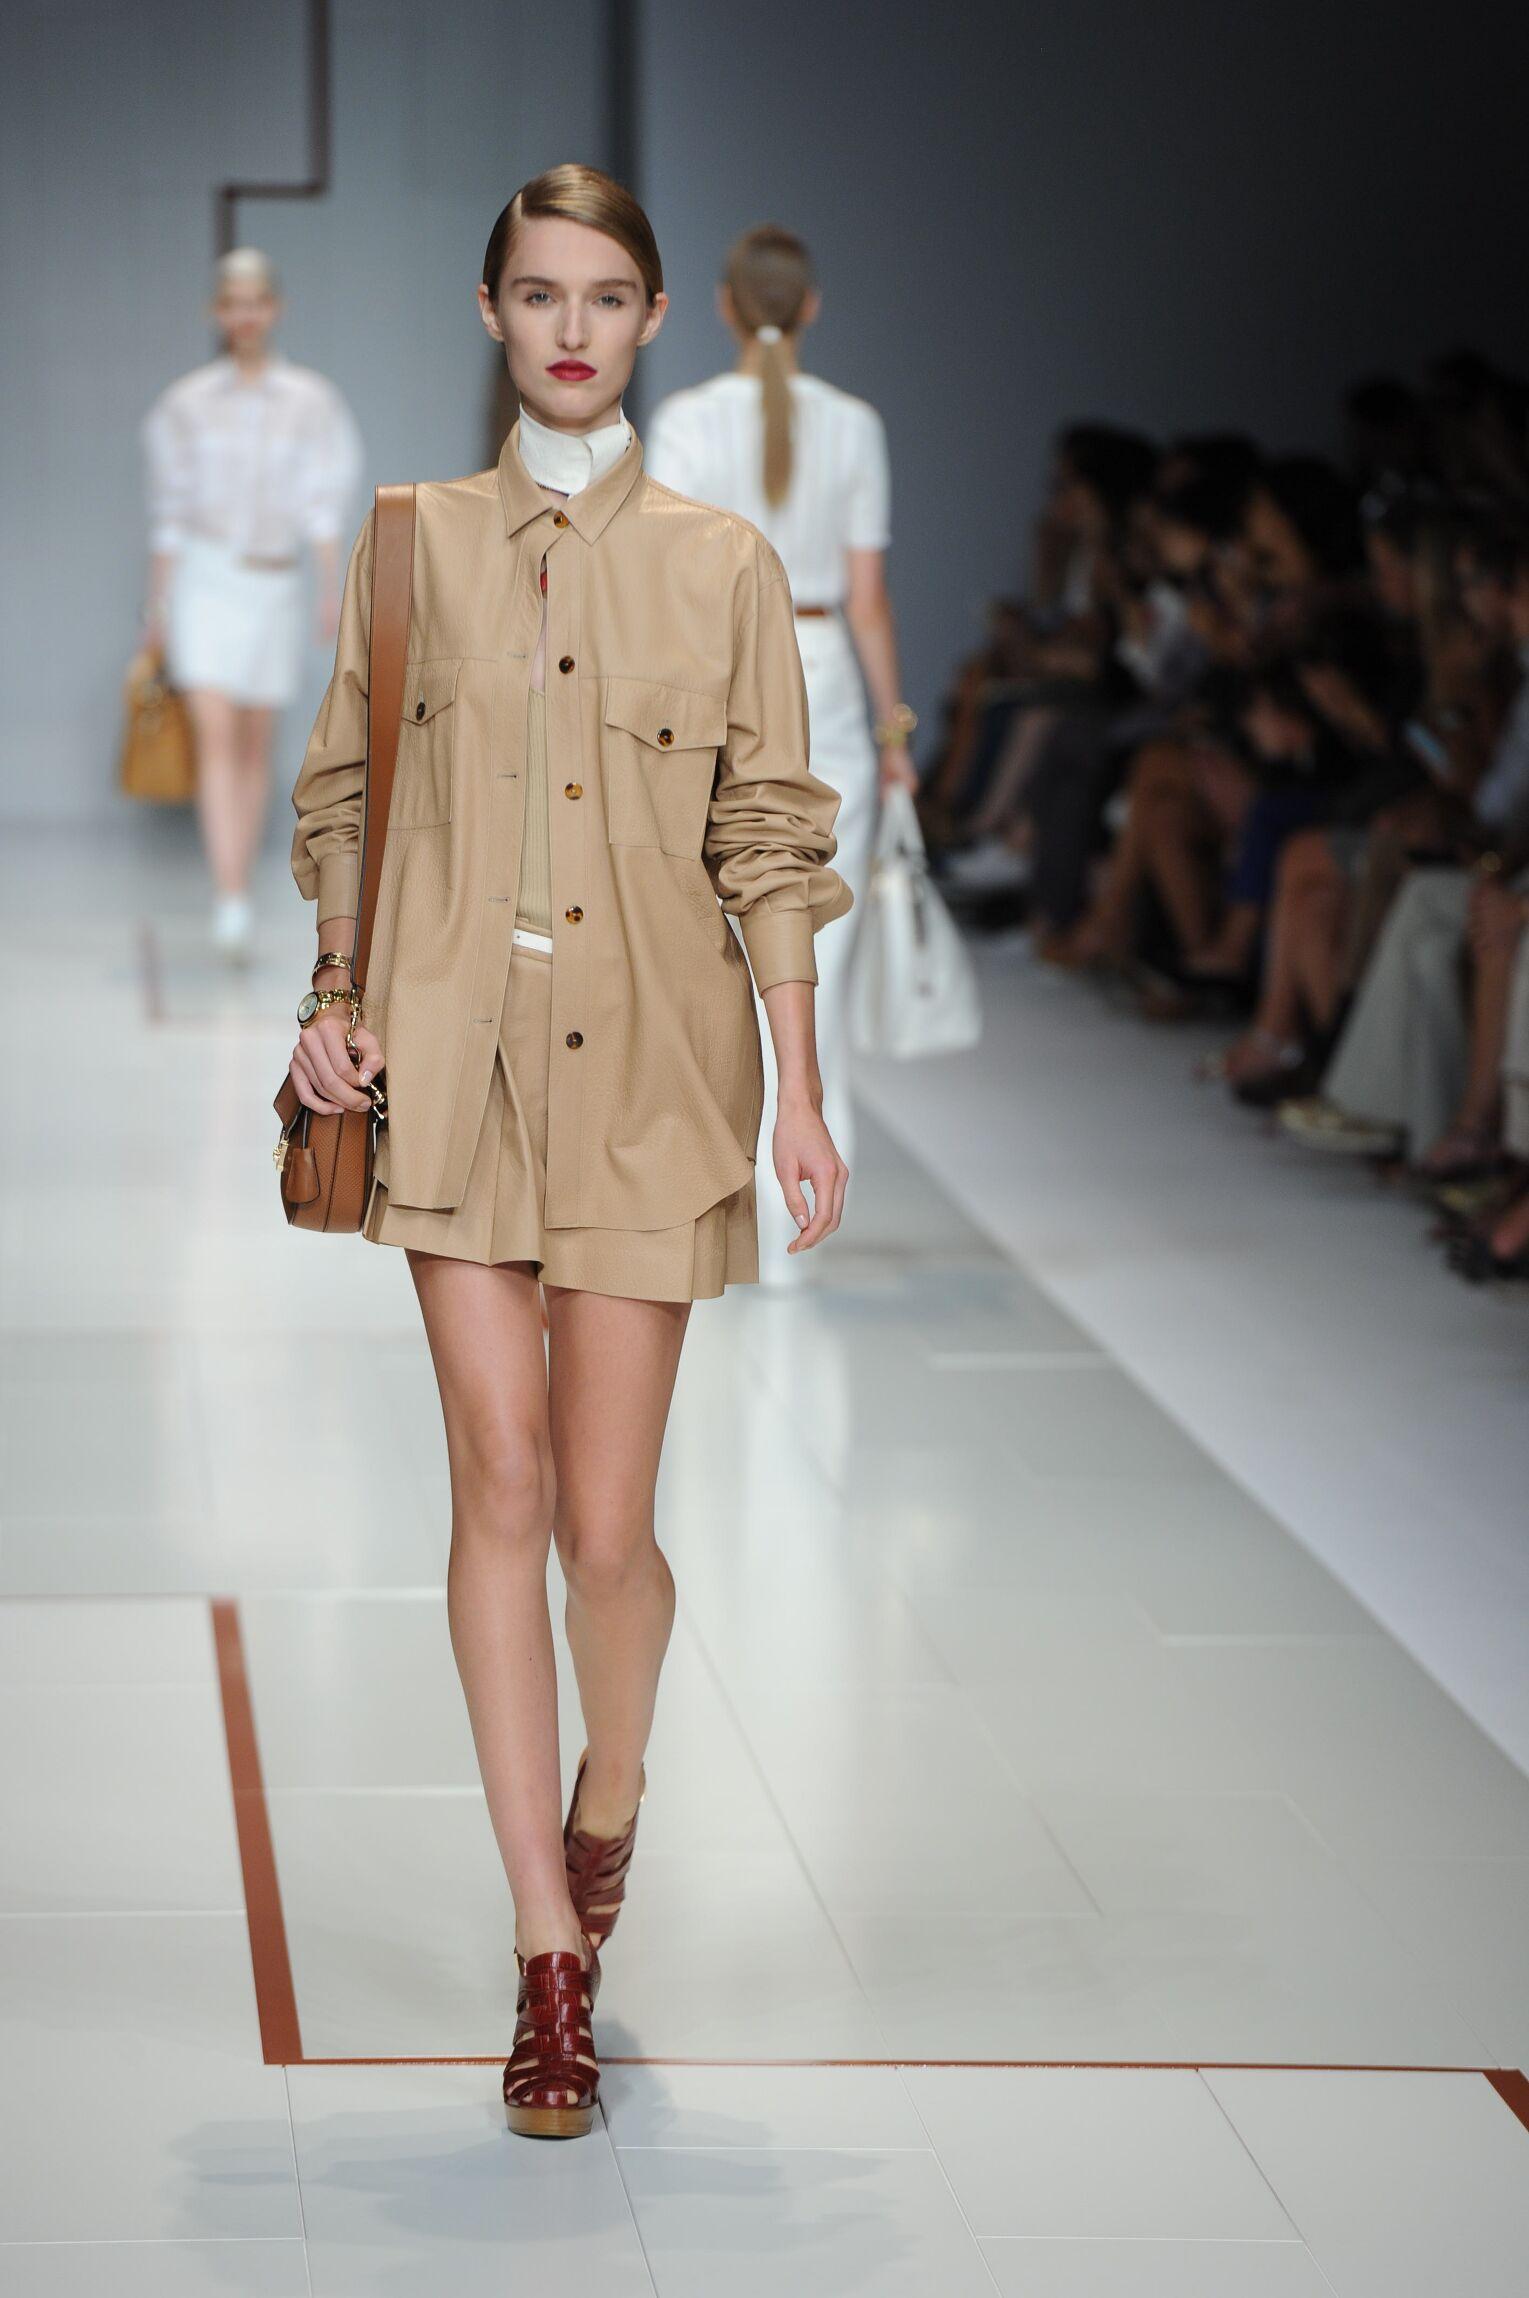 Spring Summer 2015 Fashion Model Trussardi